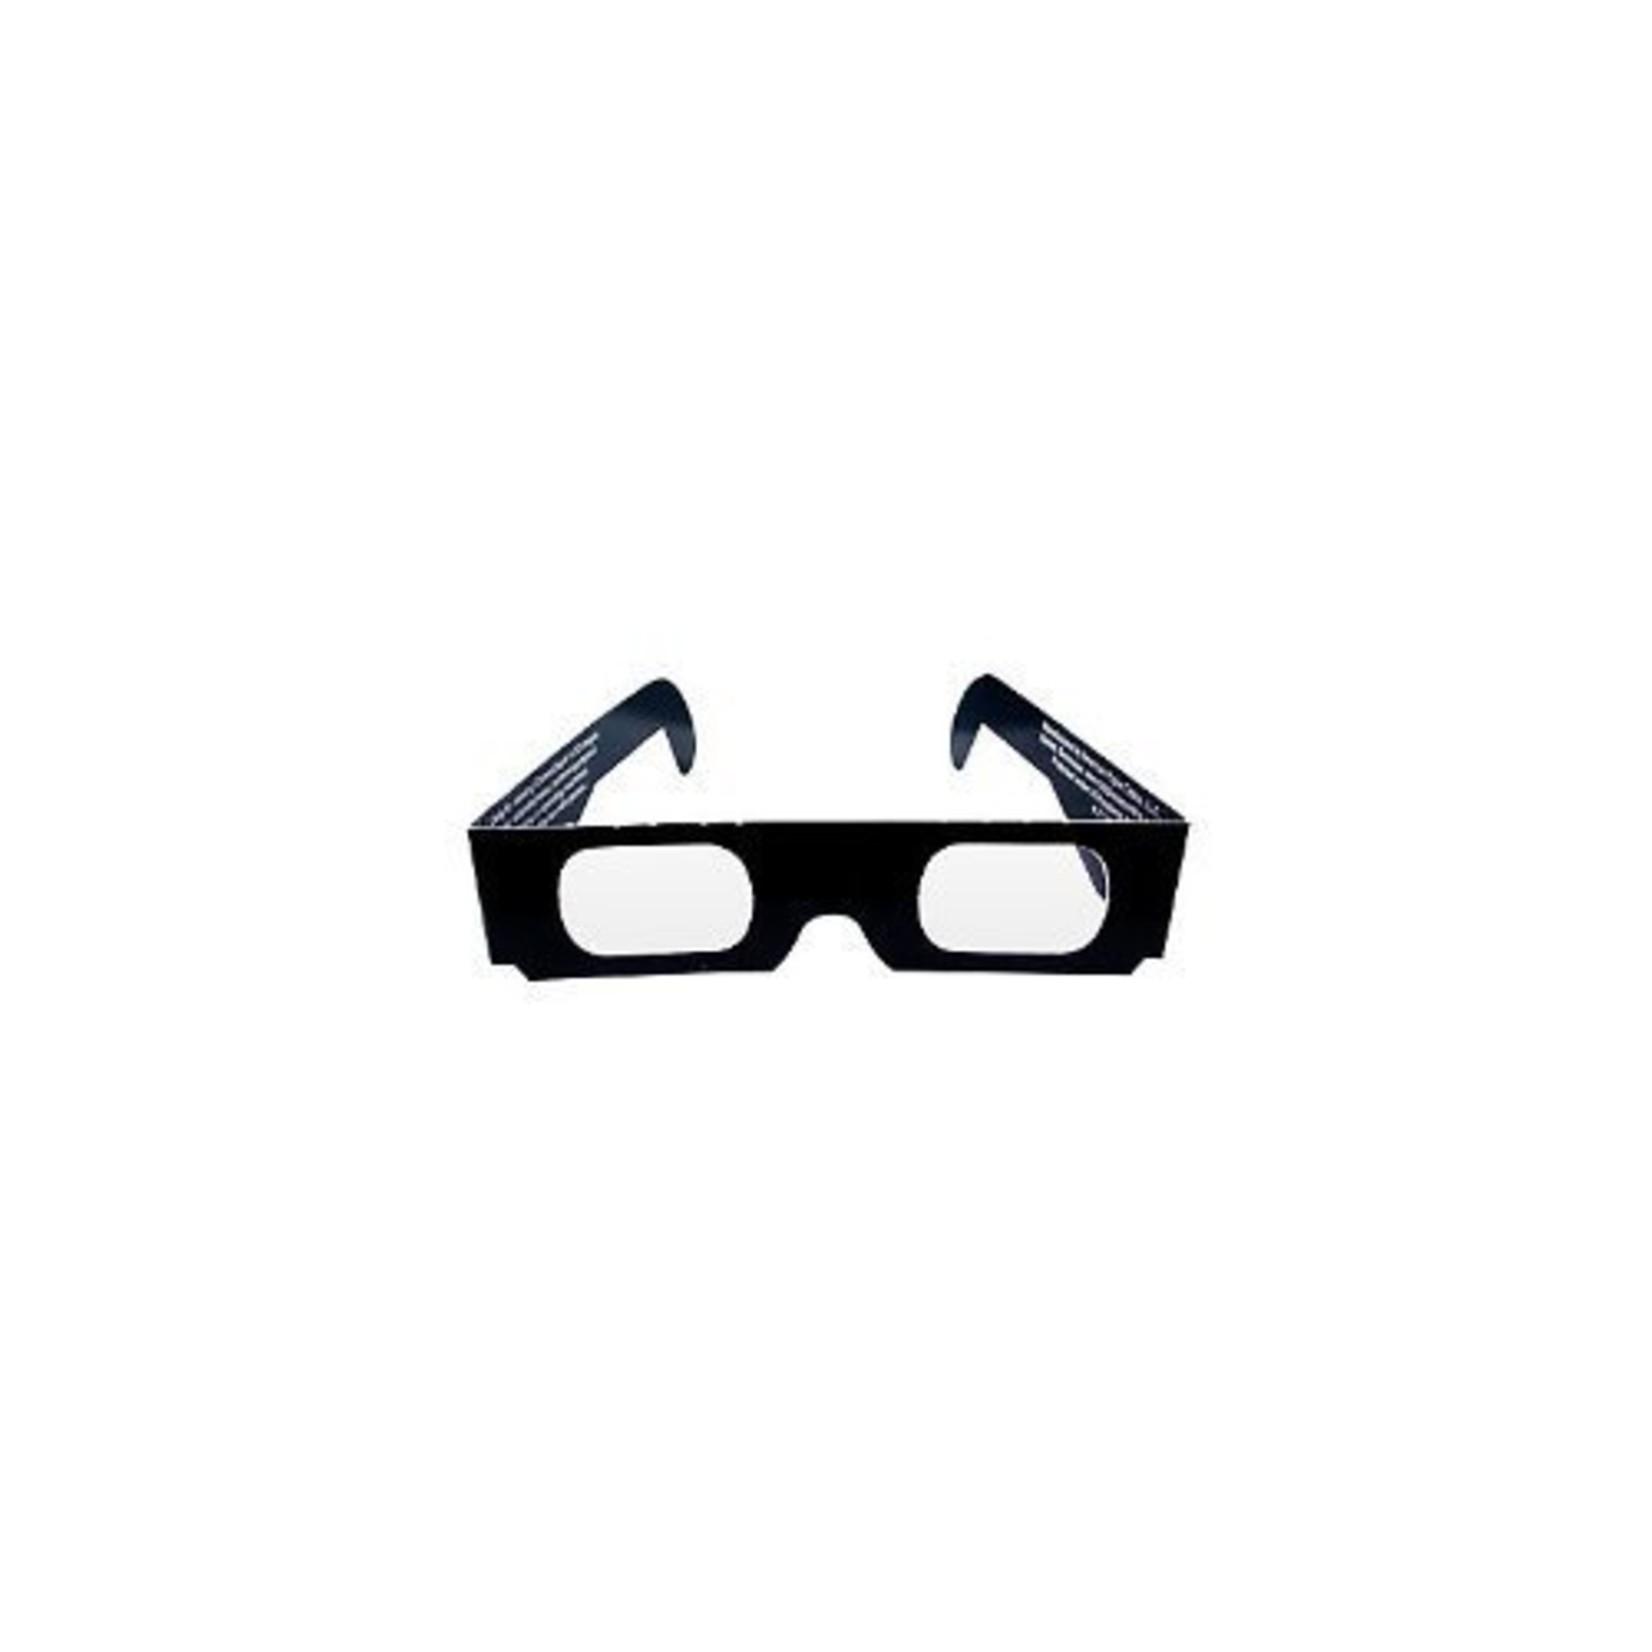 "3-D Glasses- Black Paper- 6"" Wide"